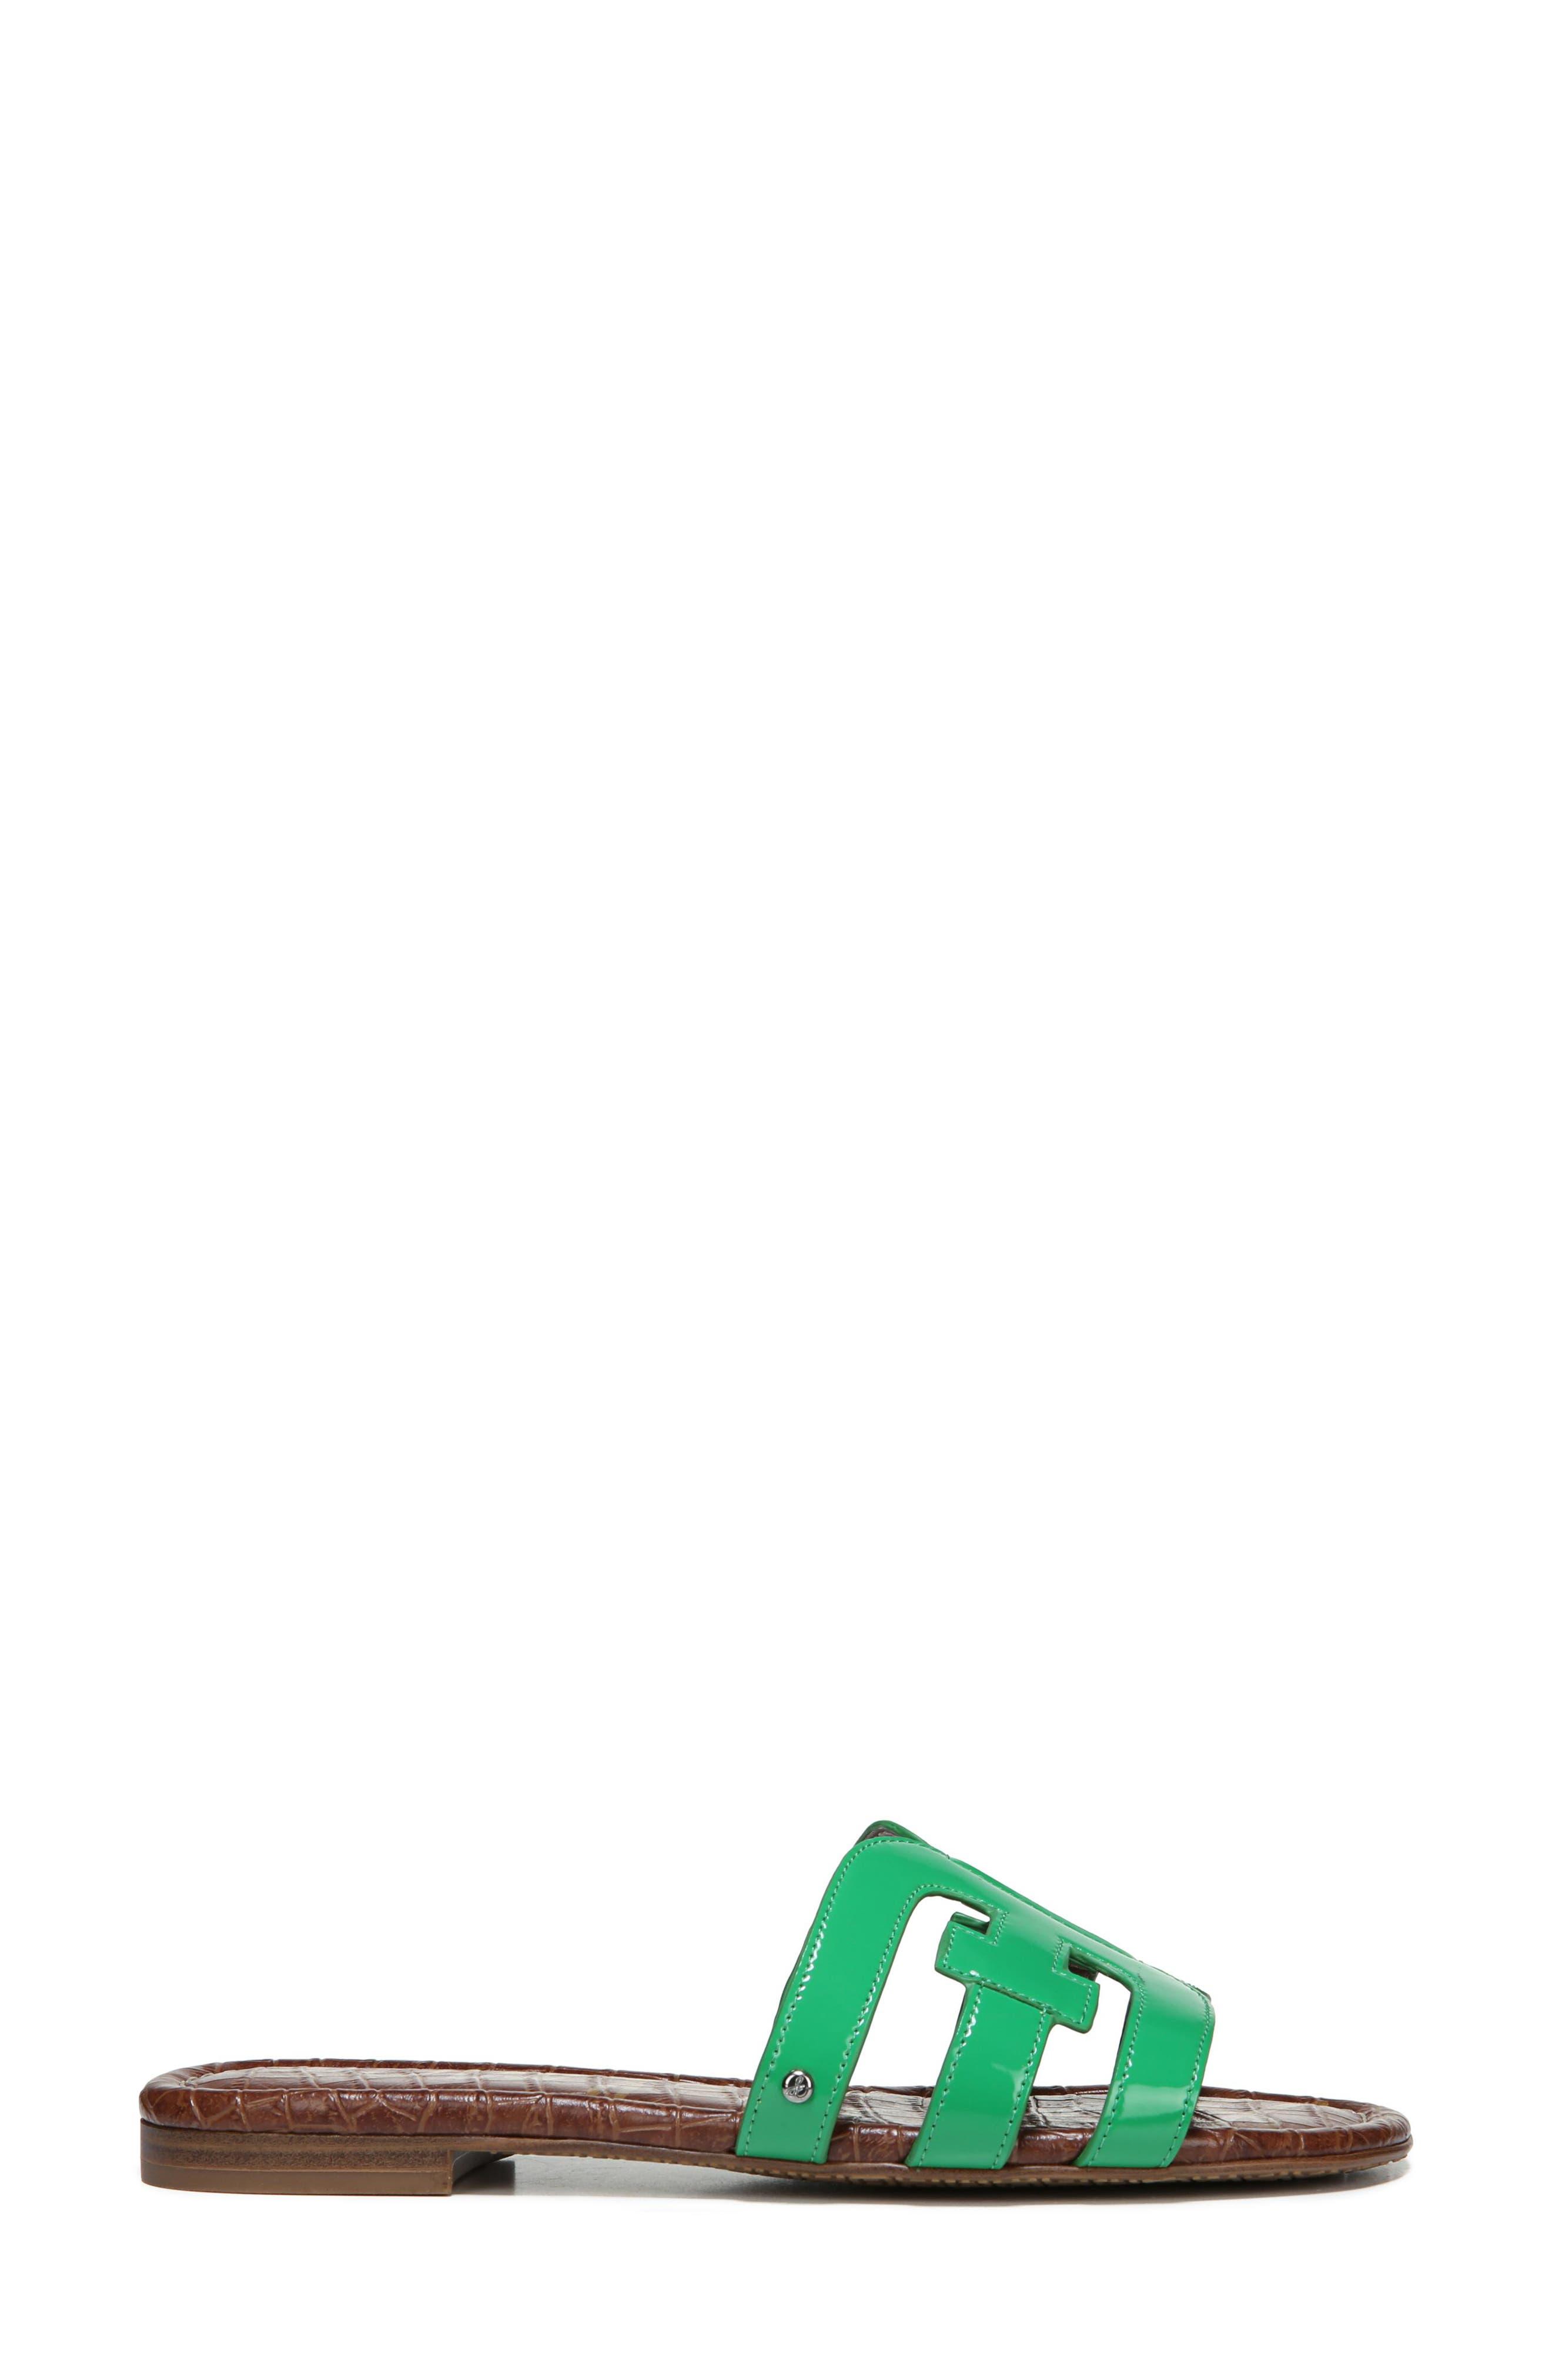 Bay Cutout Slide Sandal,                             Alternate thumbnail 7, color,                             LEAF GREEN PATENT LEATHER